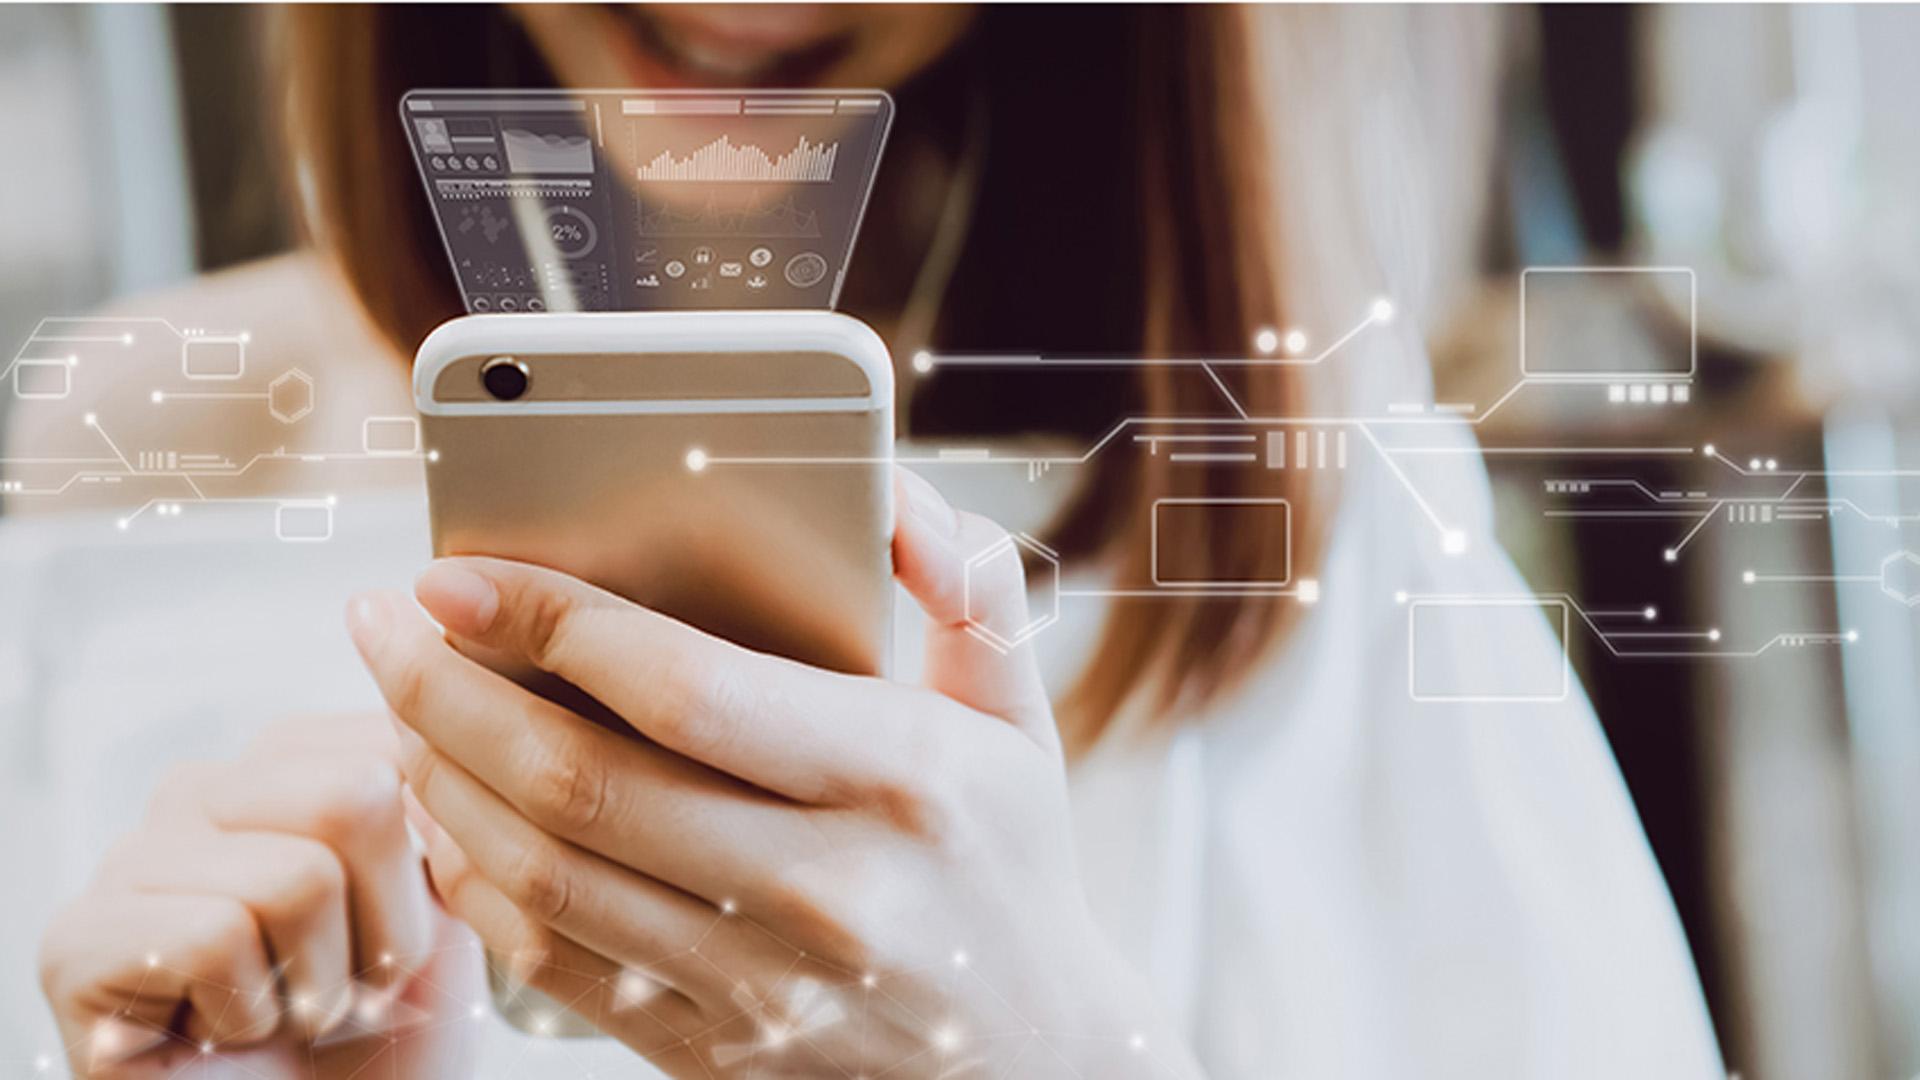 9 Key Trends in Digital Marketing for 2018